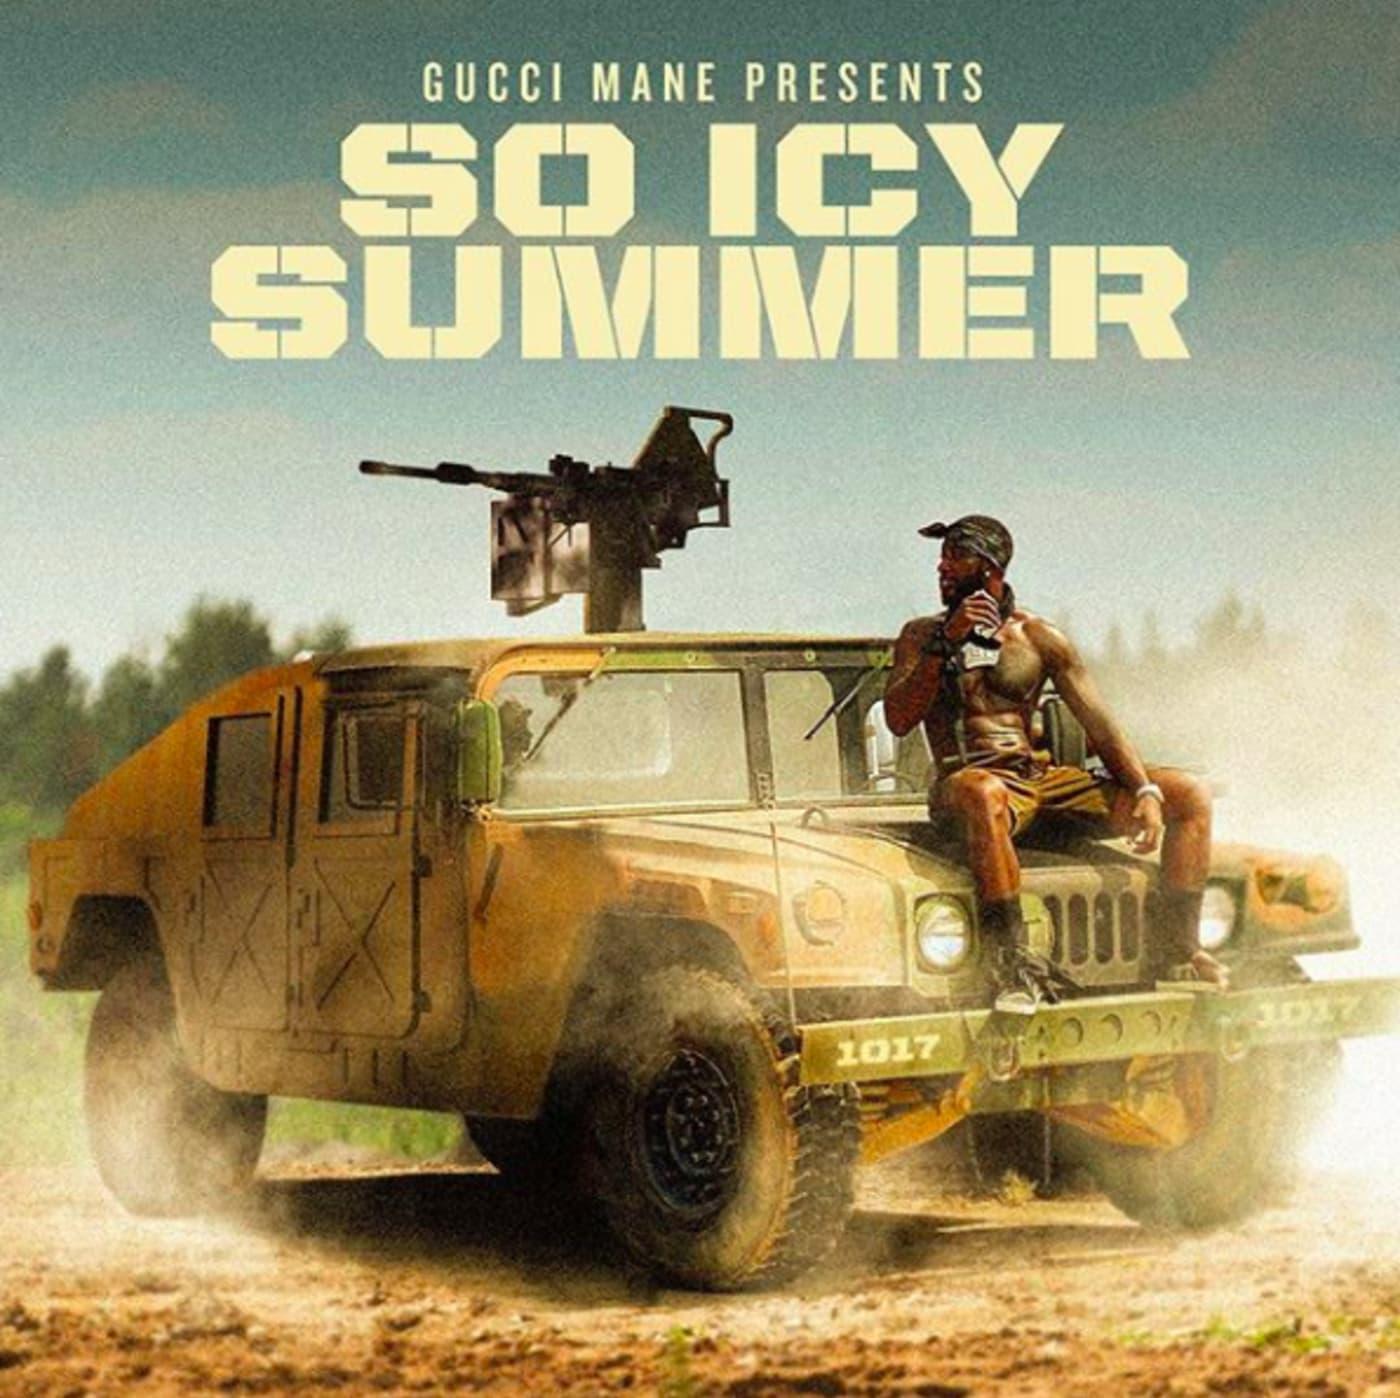 Gucci Mane Presents So Icy Summer